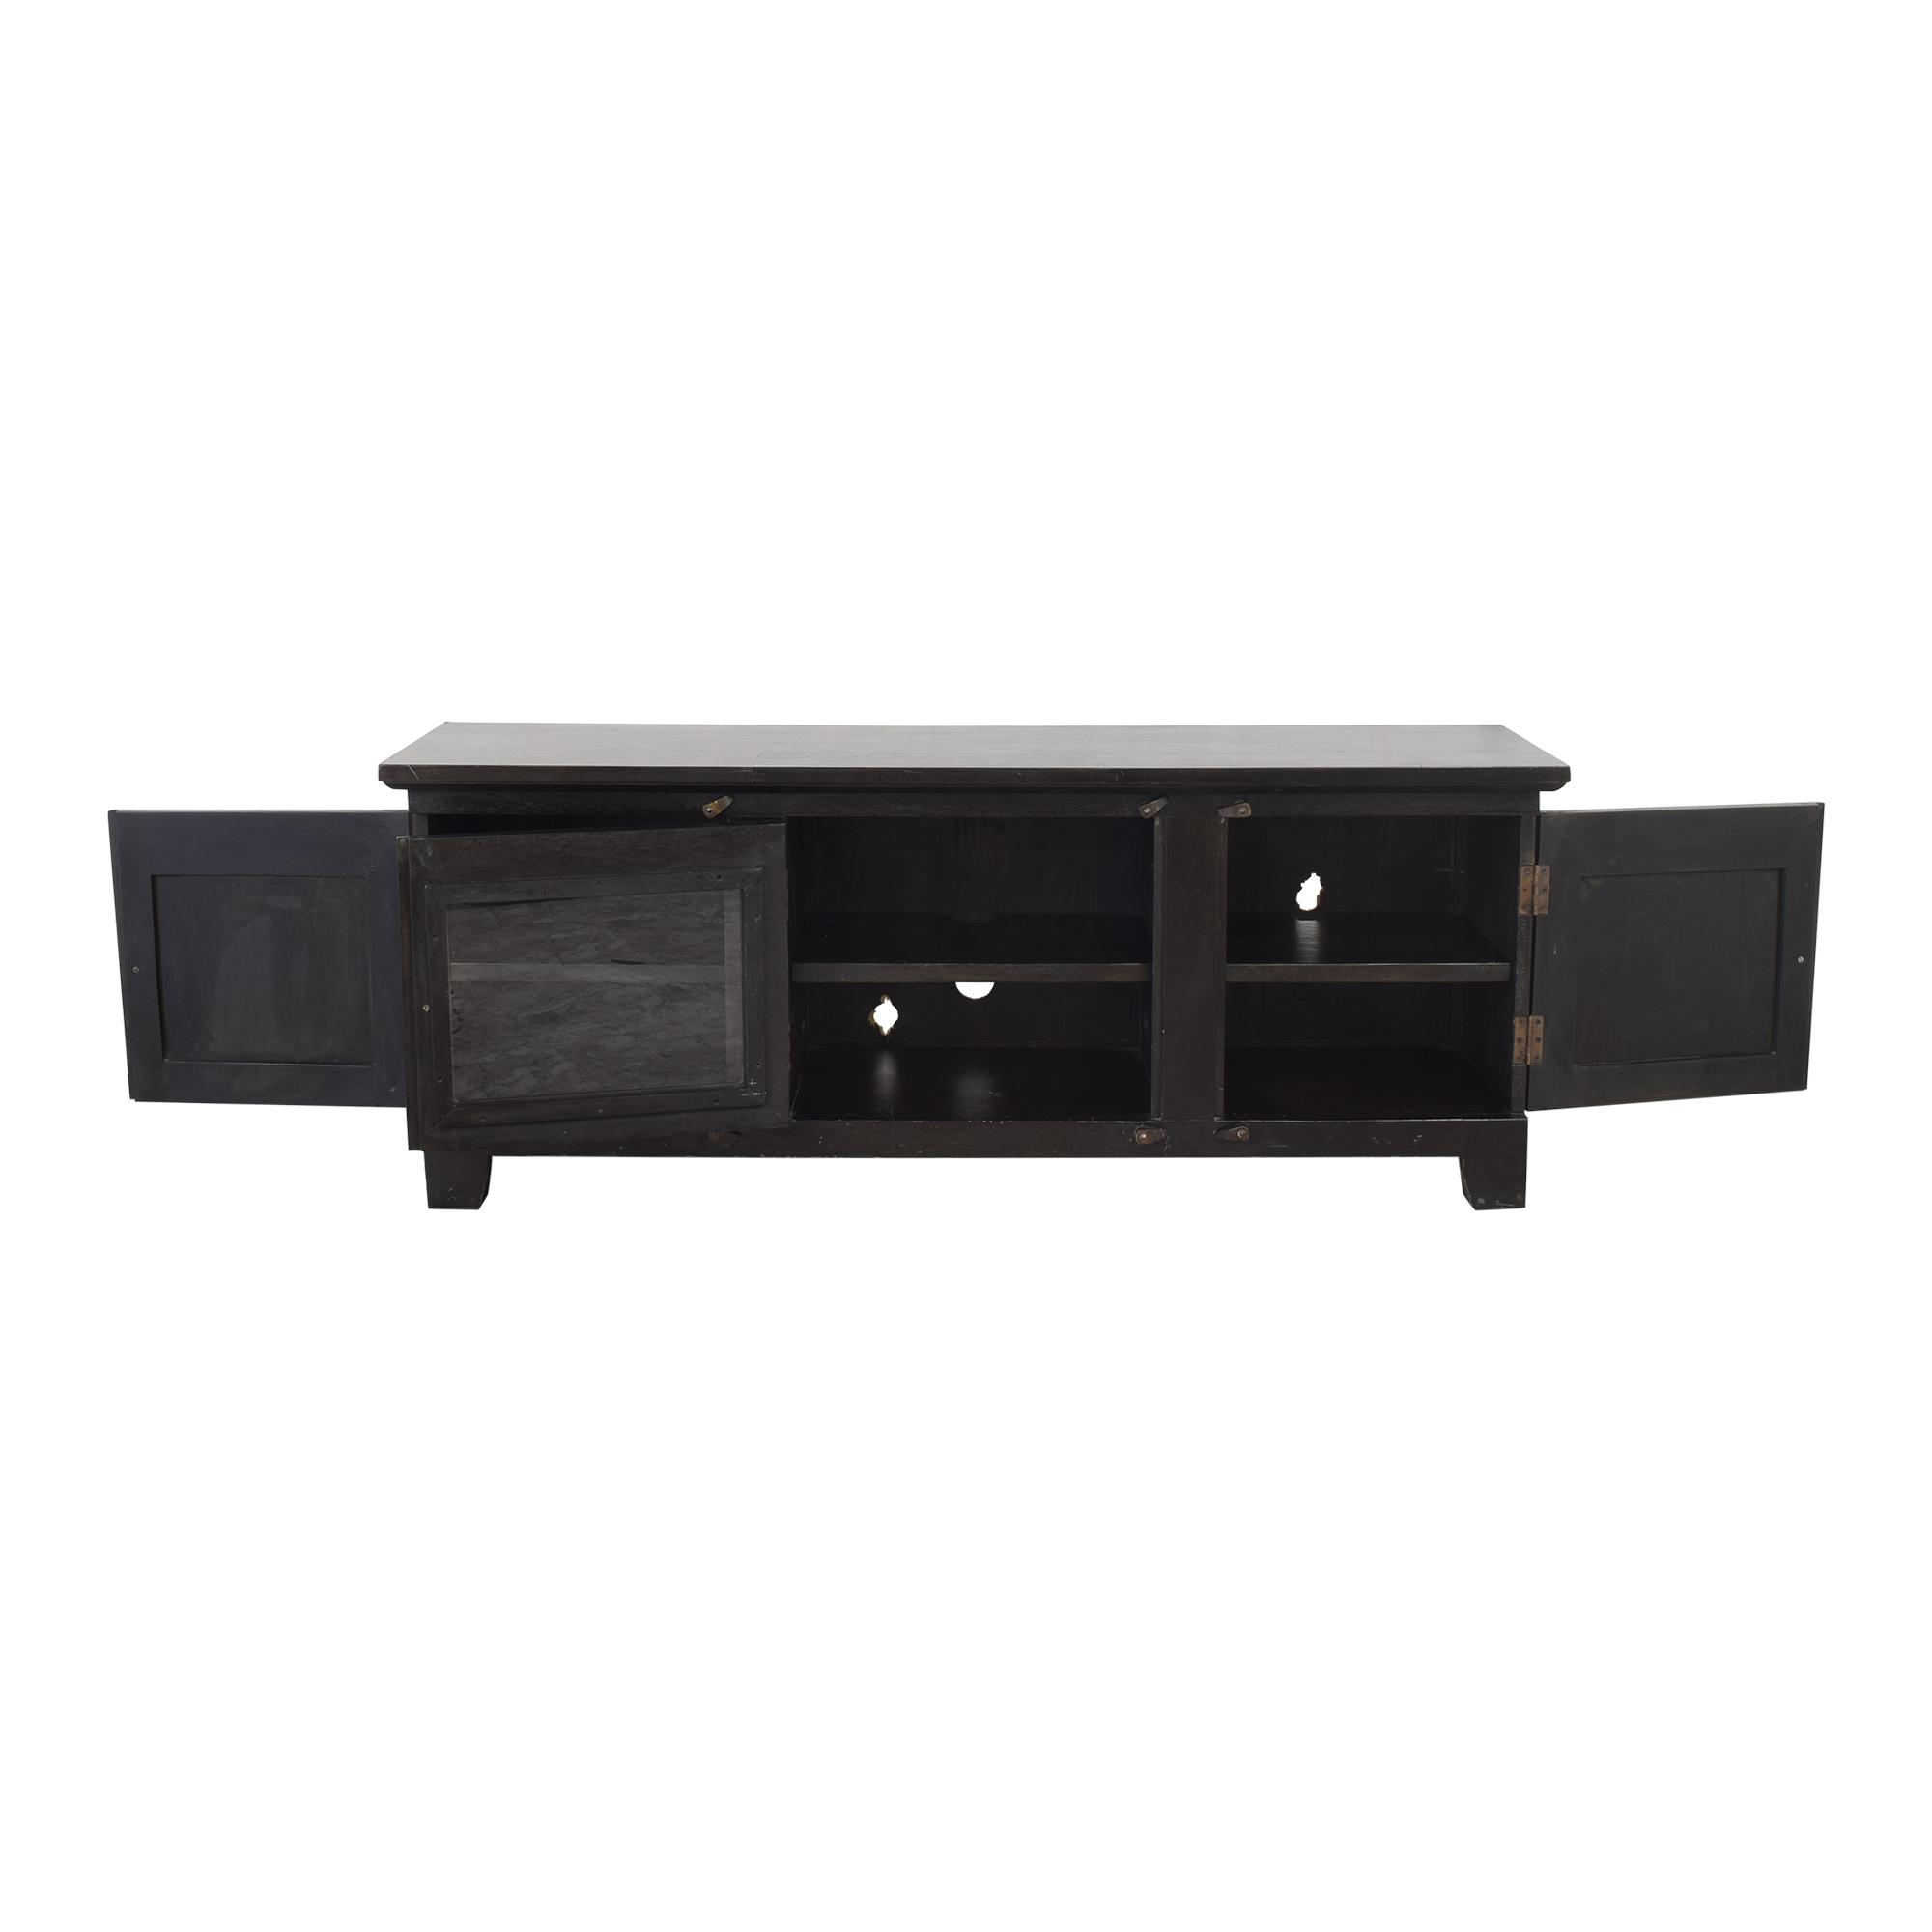 buy Crate & Barrel Custom Basque Media Console Crate & Barrel Storage